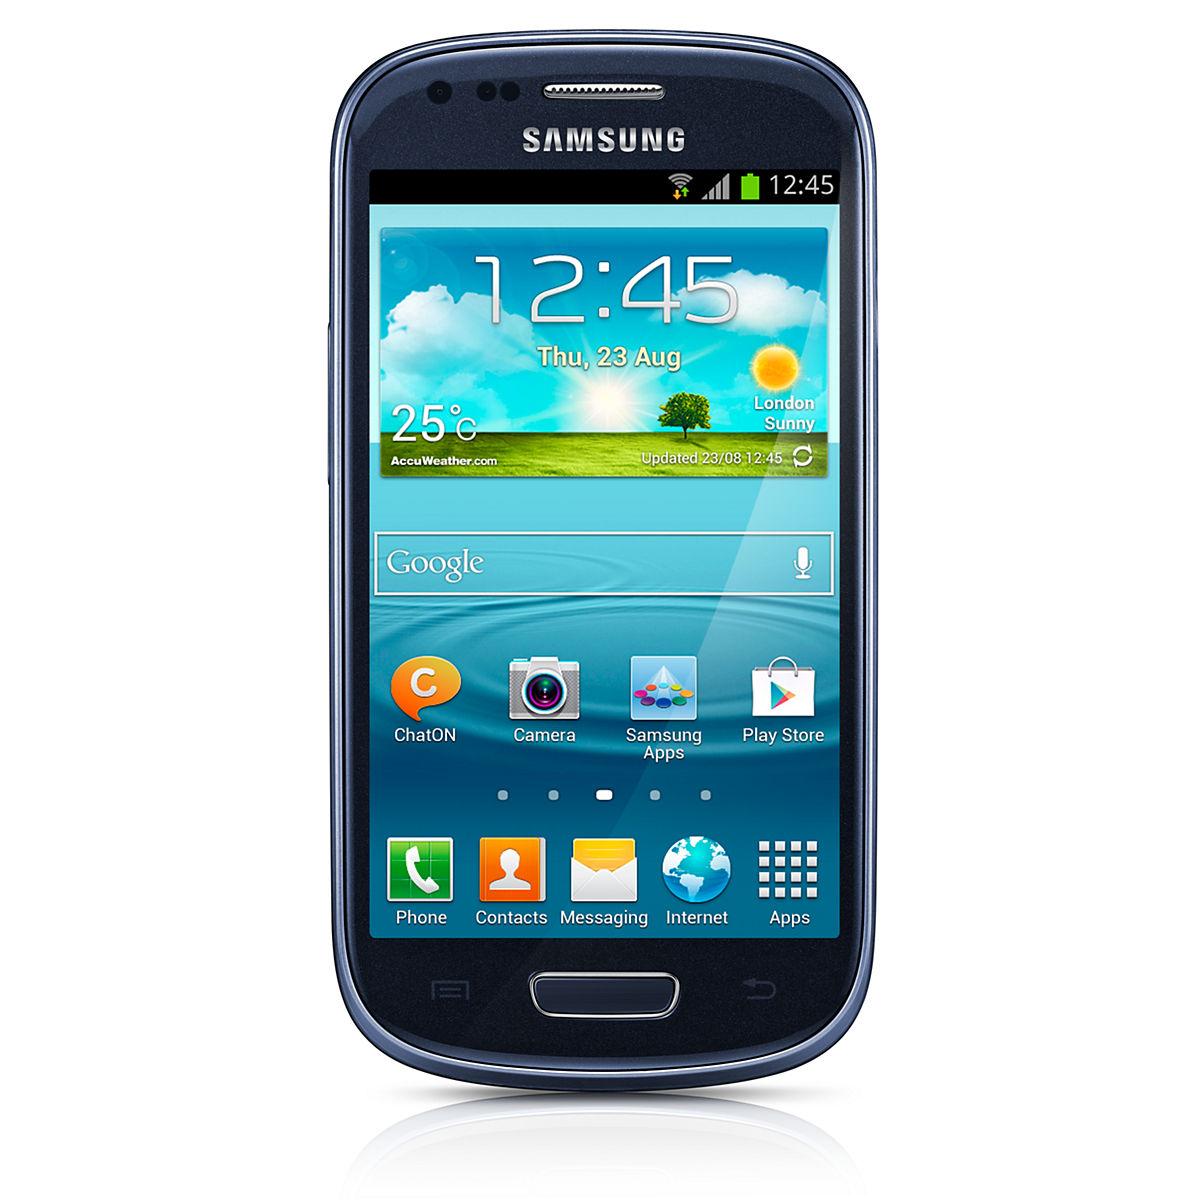 Samsung galaxy s3 mini price slot nigeria